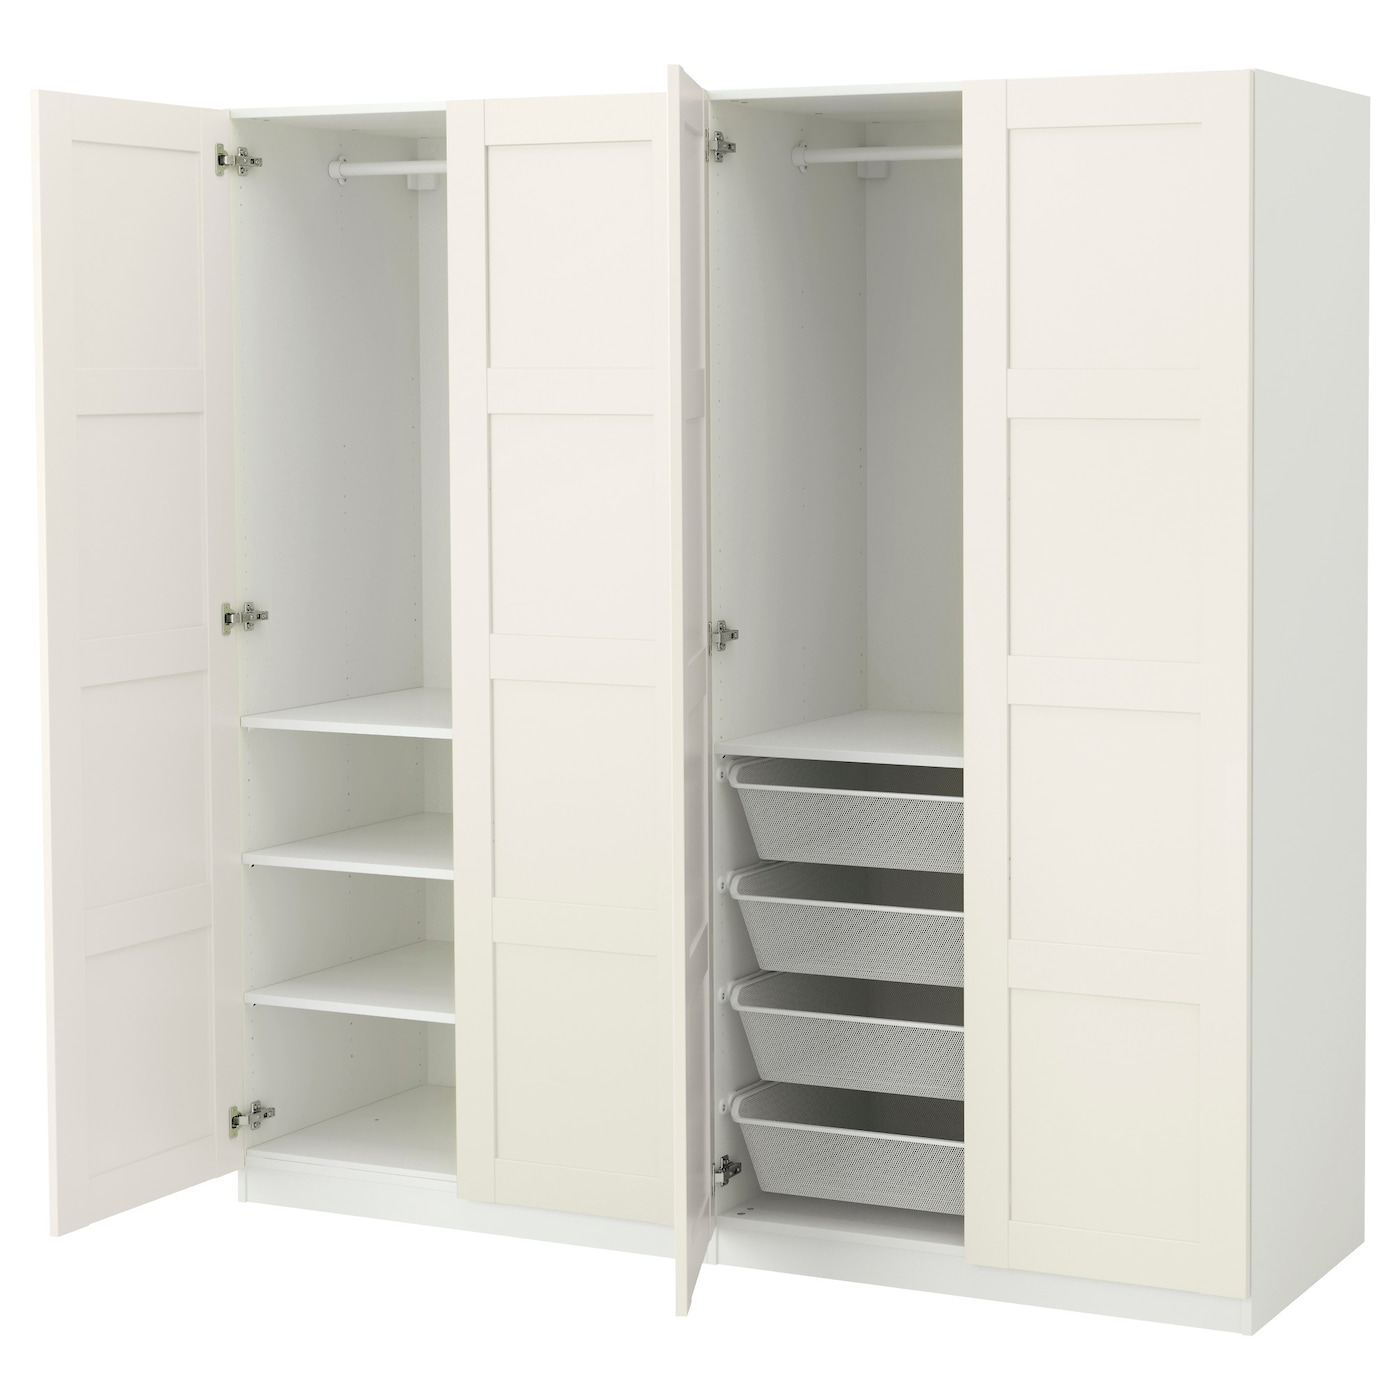 Pax wardrobe white bergsbo white 200x60x201 cm ikea - Dimension dressing ikea ...